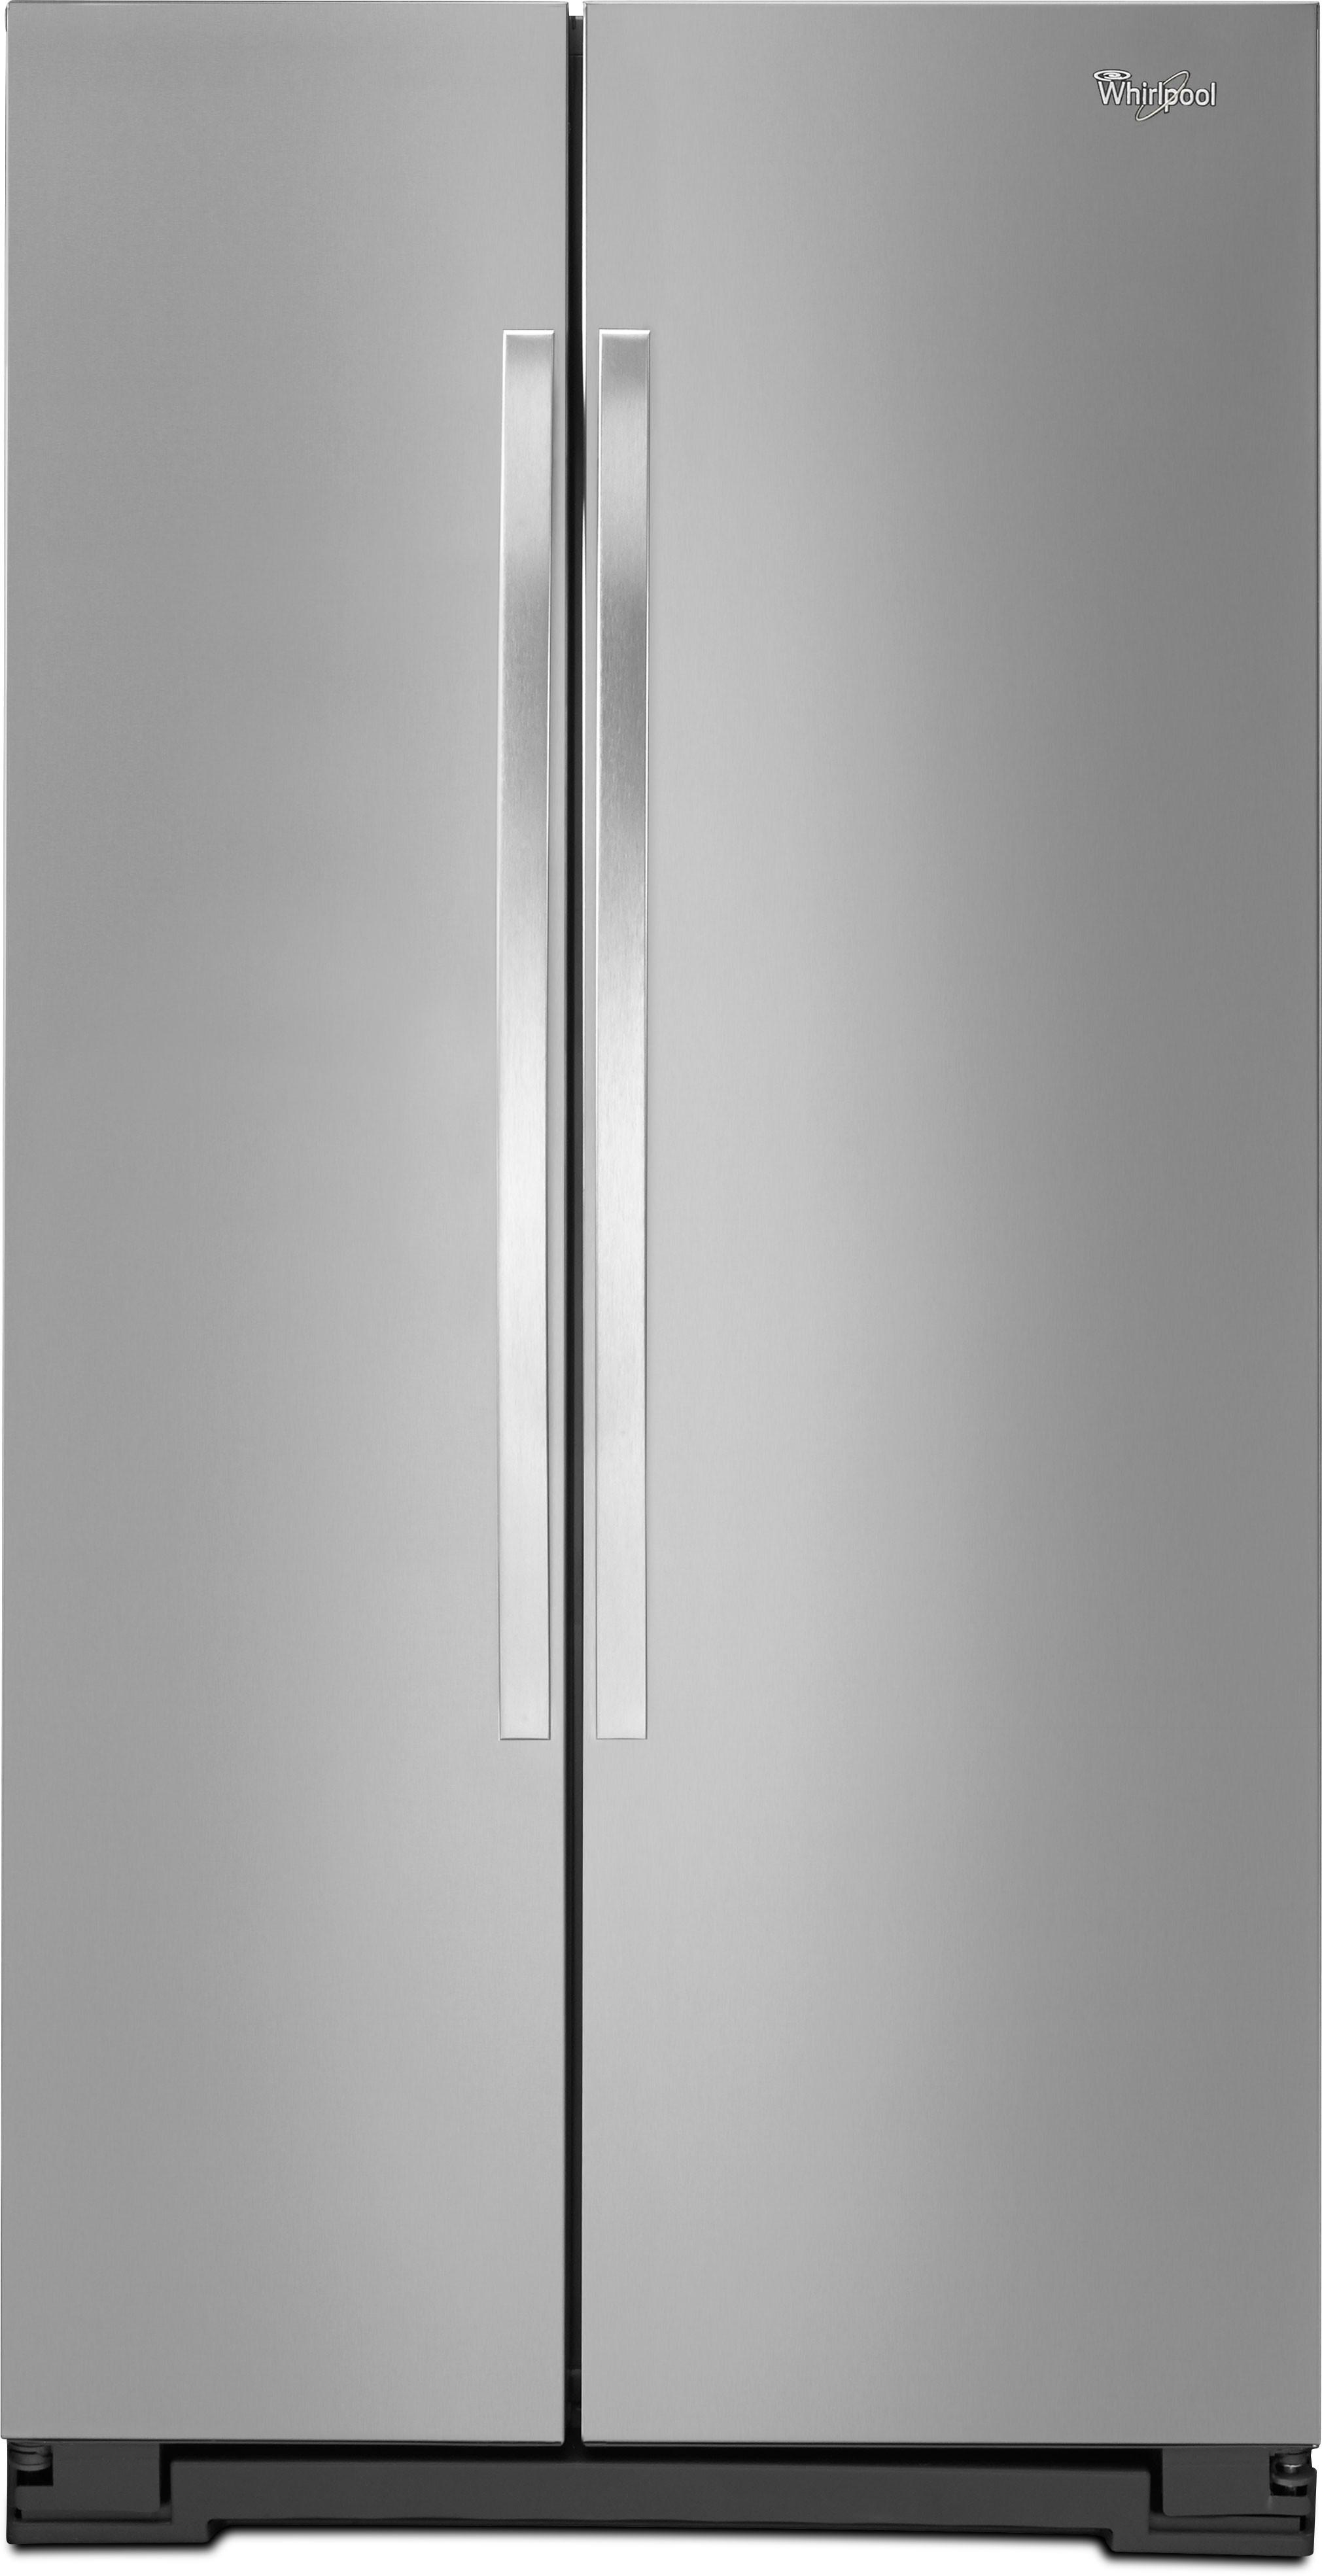 Side by side refrigerator 30 inch width - Side By Side Refrigerator 30 Inch Width 27